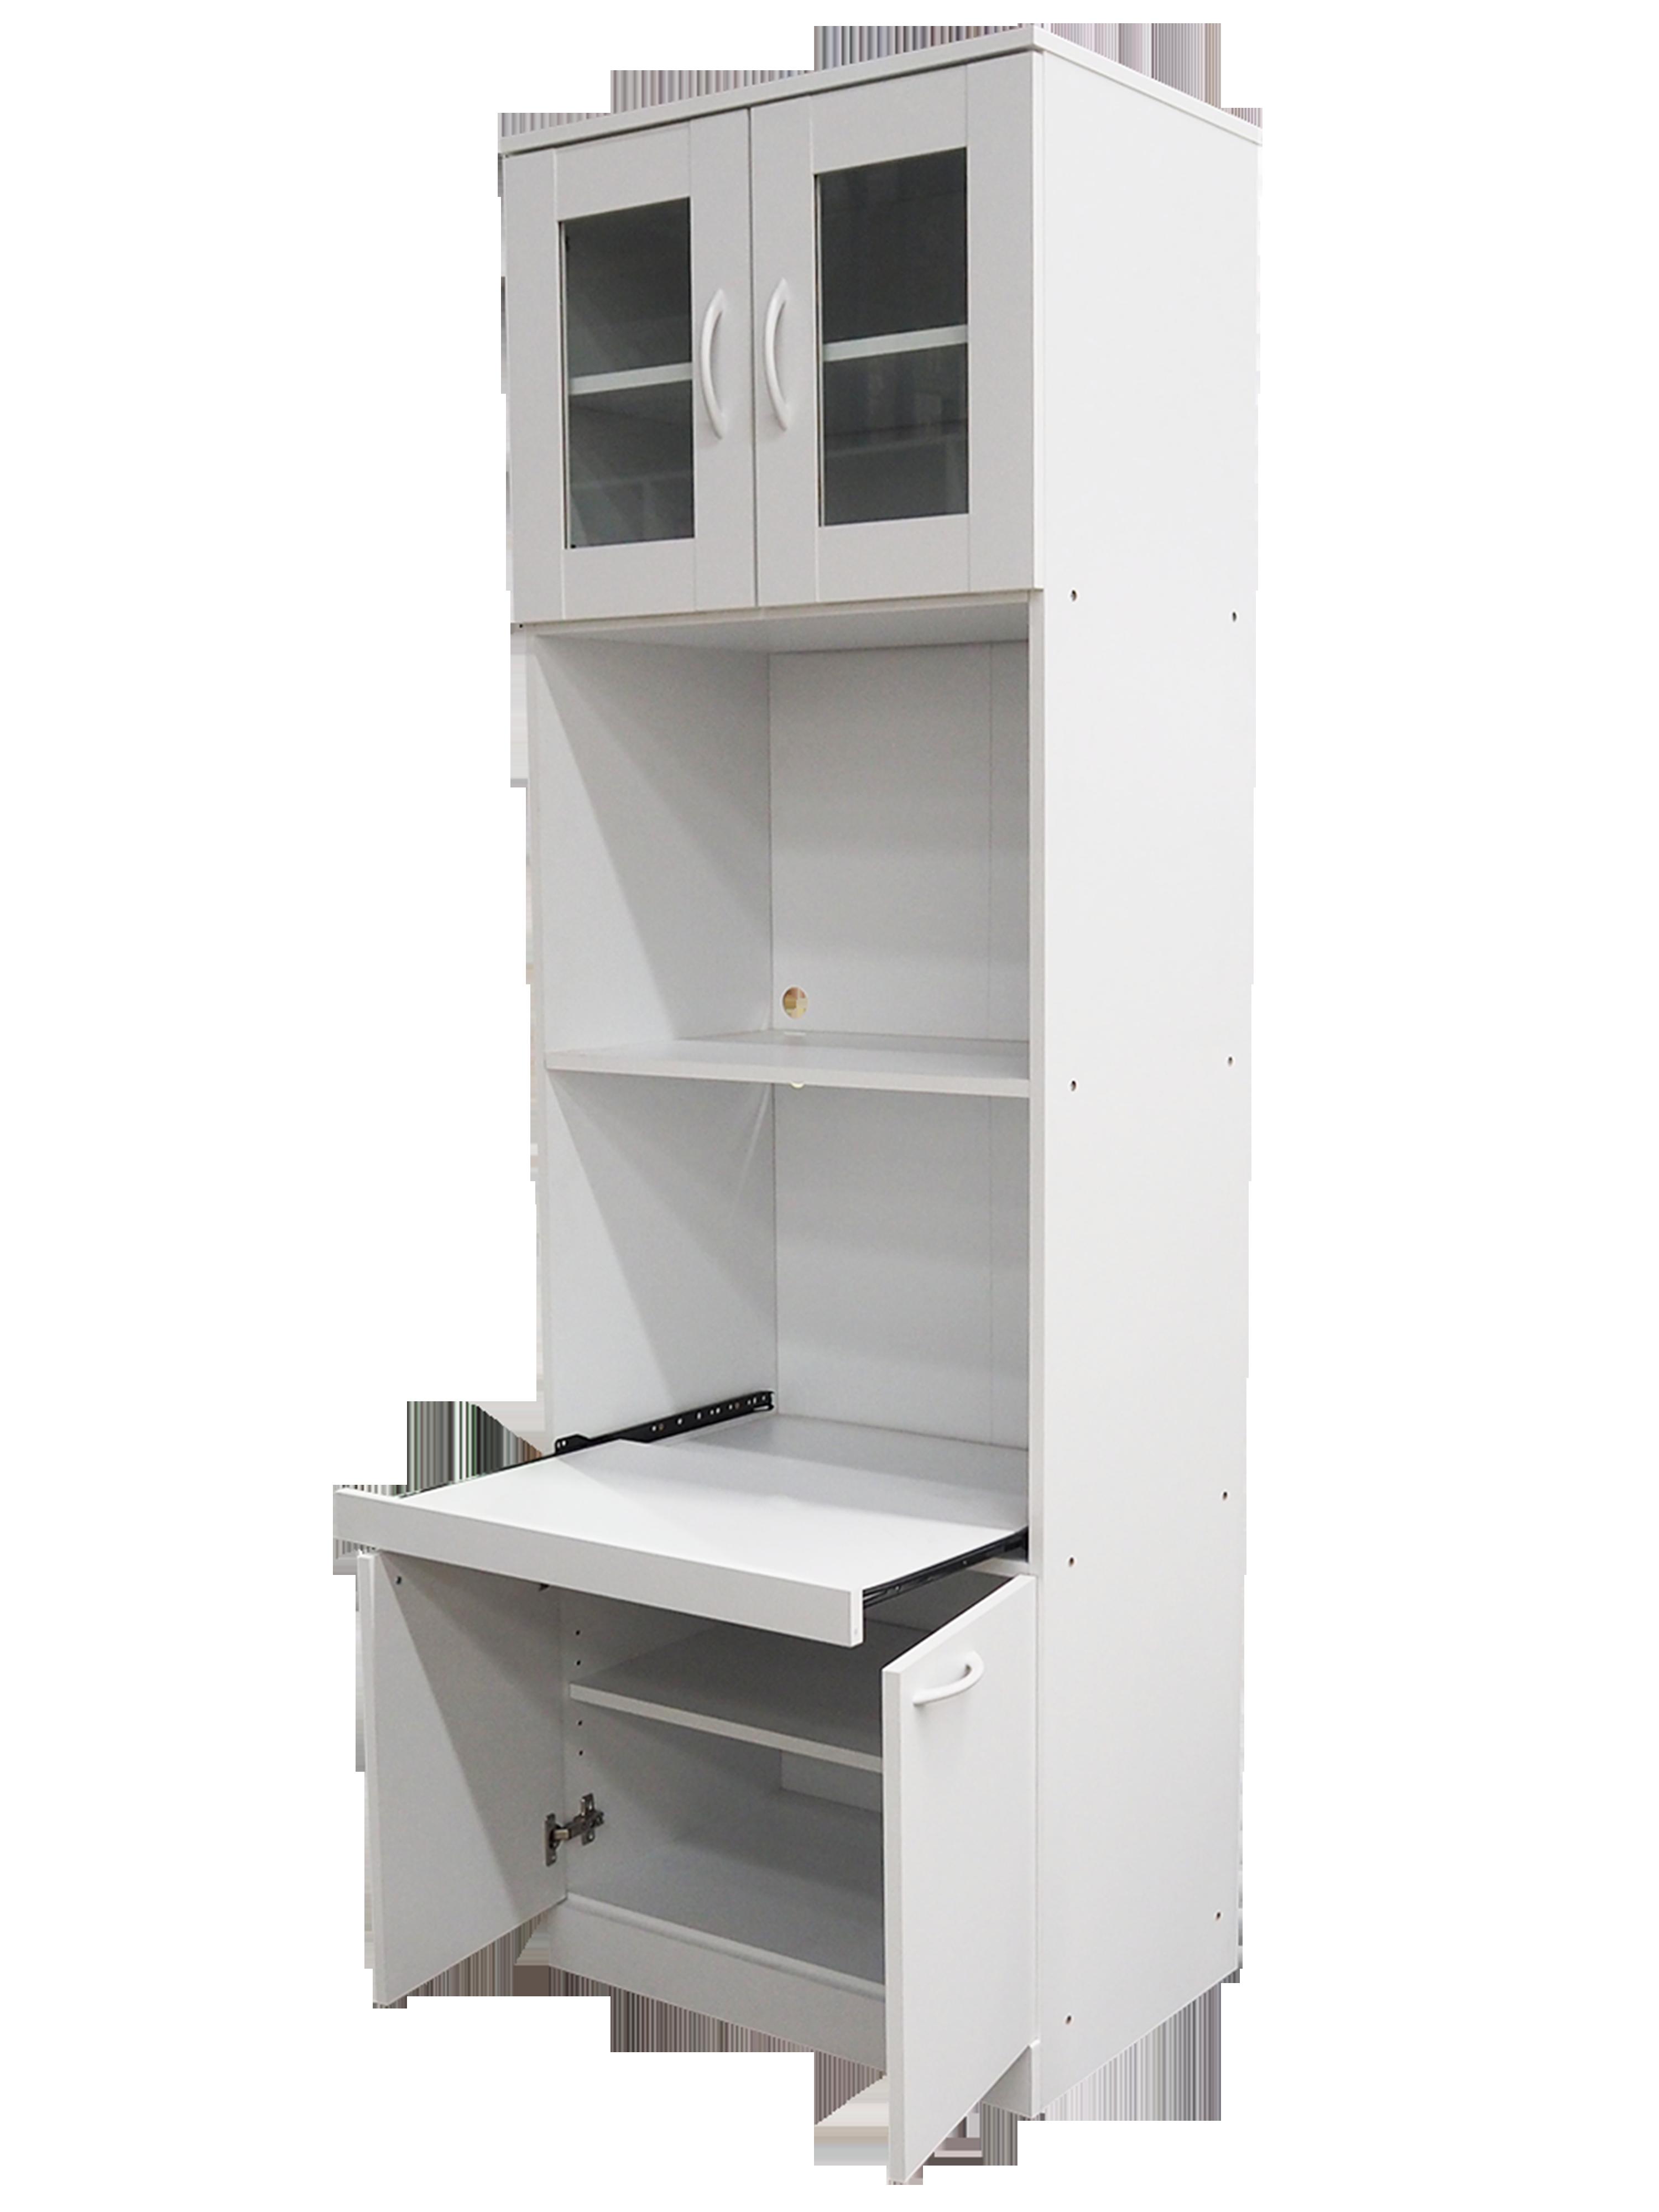 Danbury Kitchen Cabinet - TAF Furniture